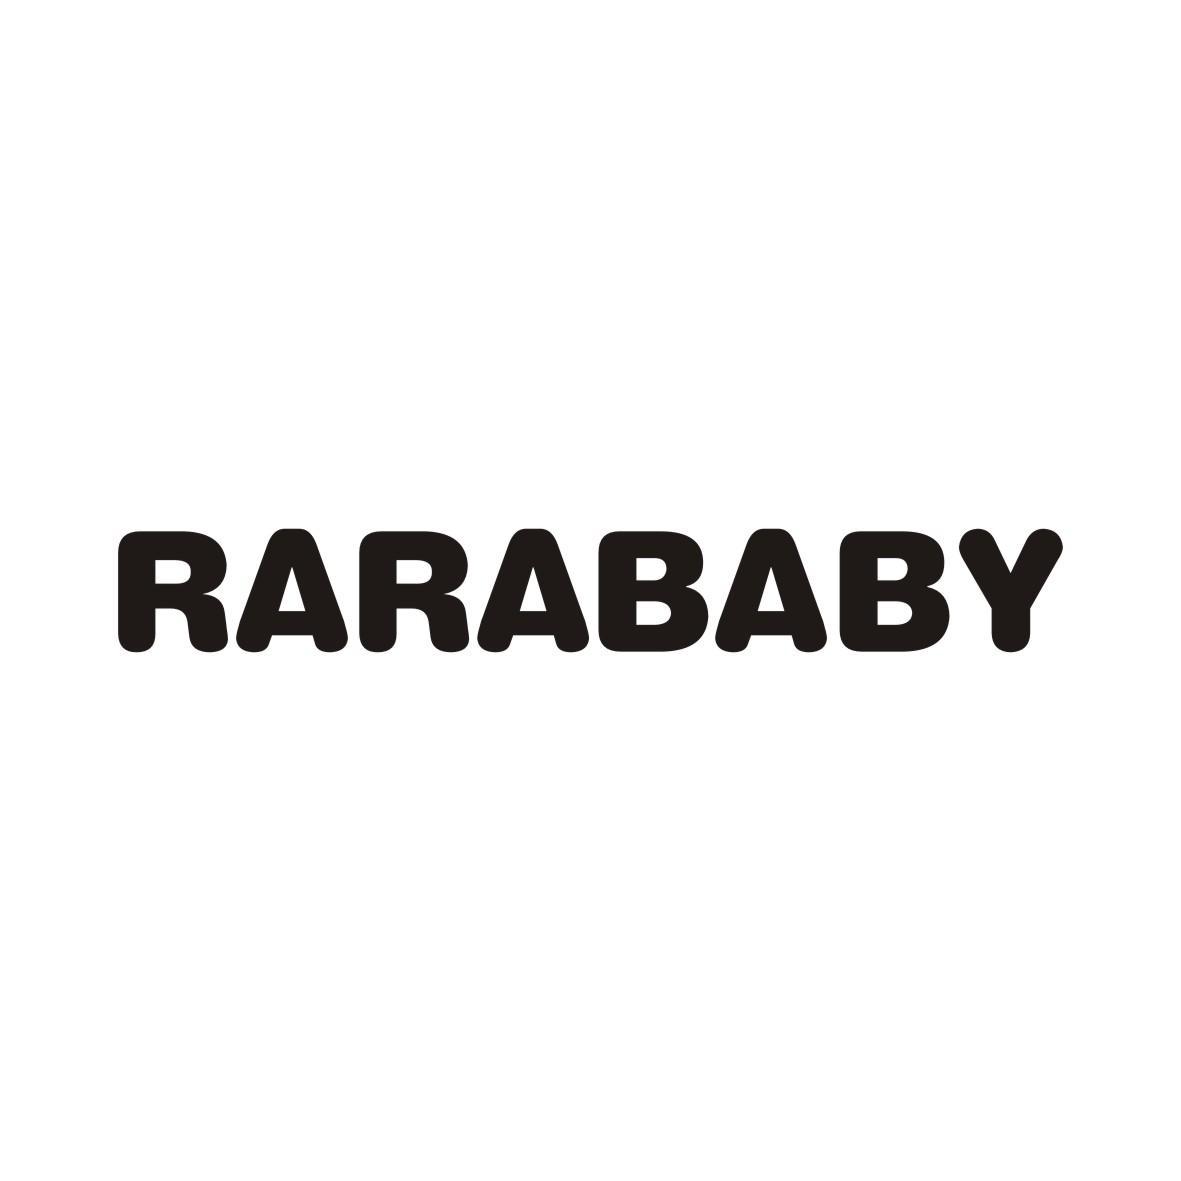 RARABABY(拉拉宝贝)